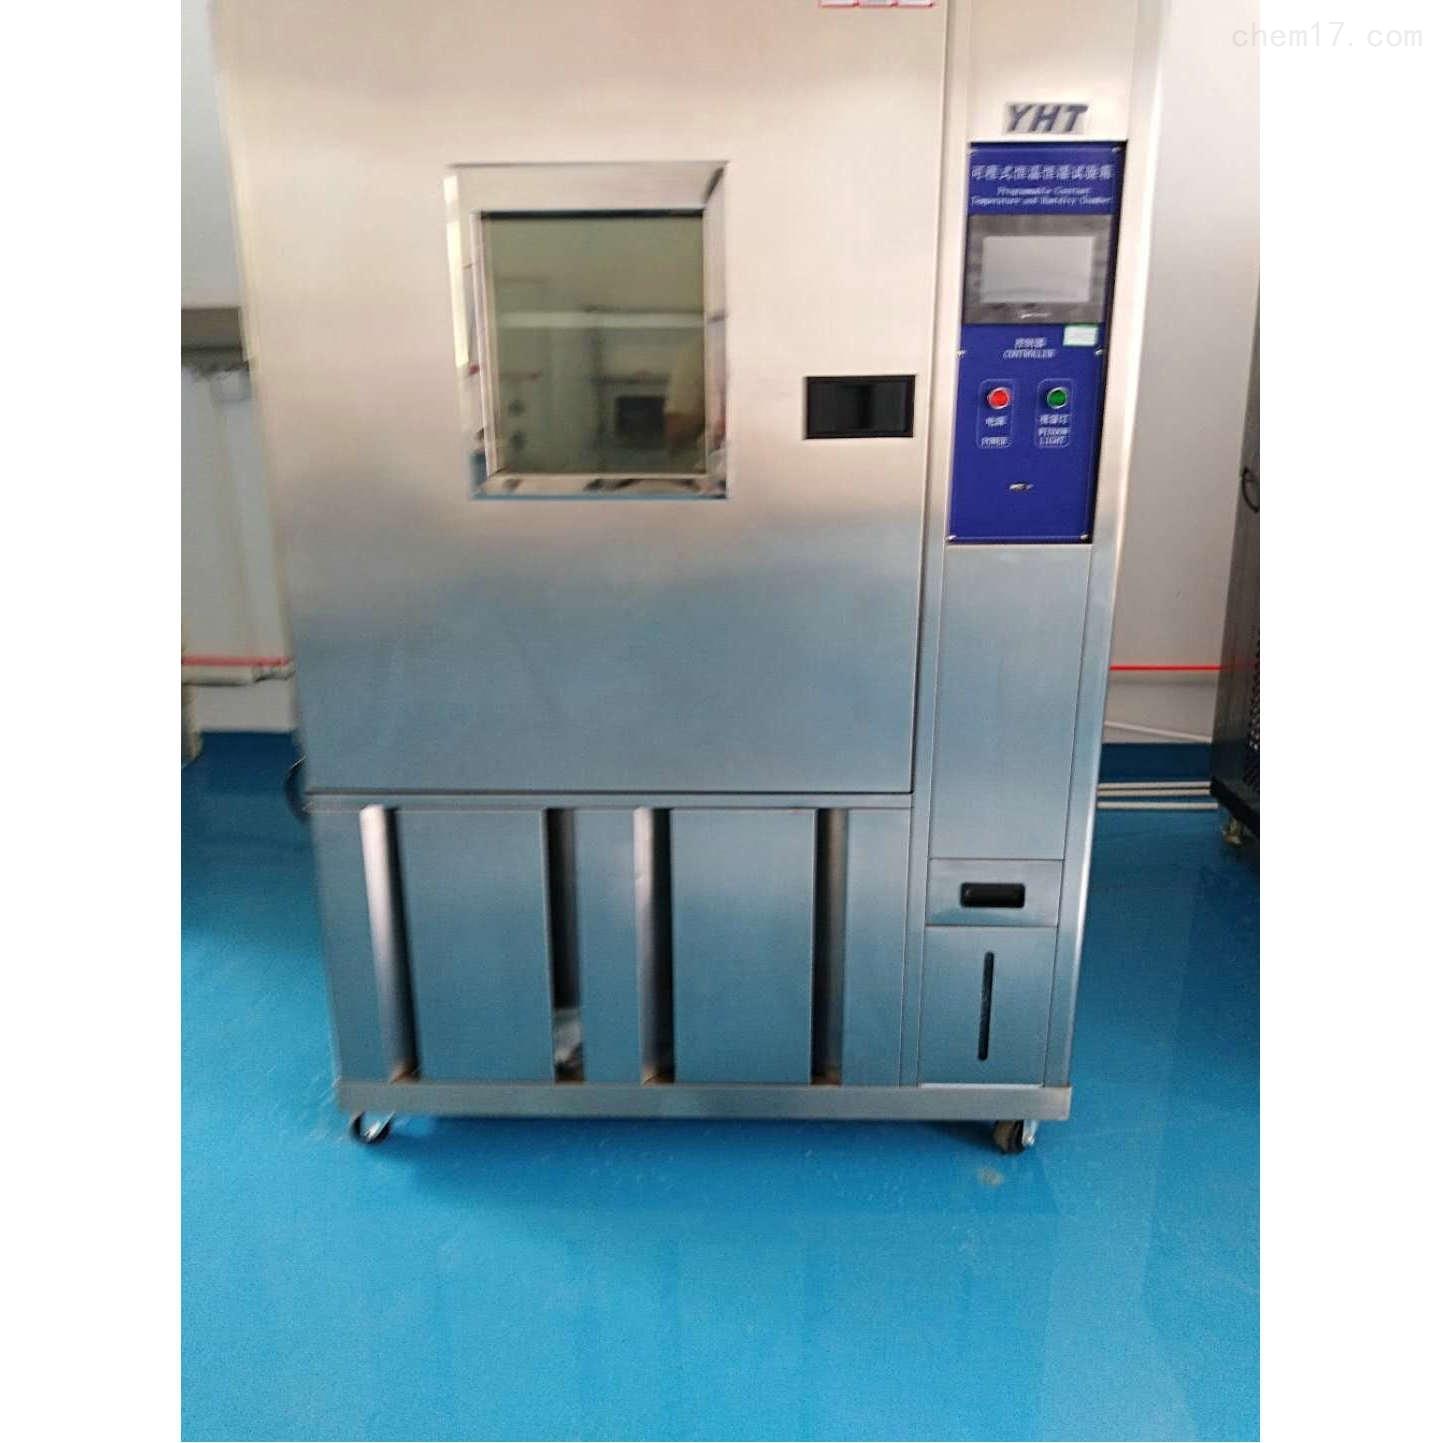 YHT-80EK可程式恒温恒湿箱